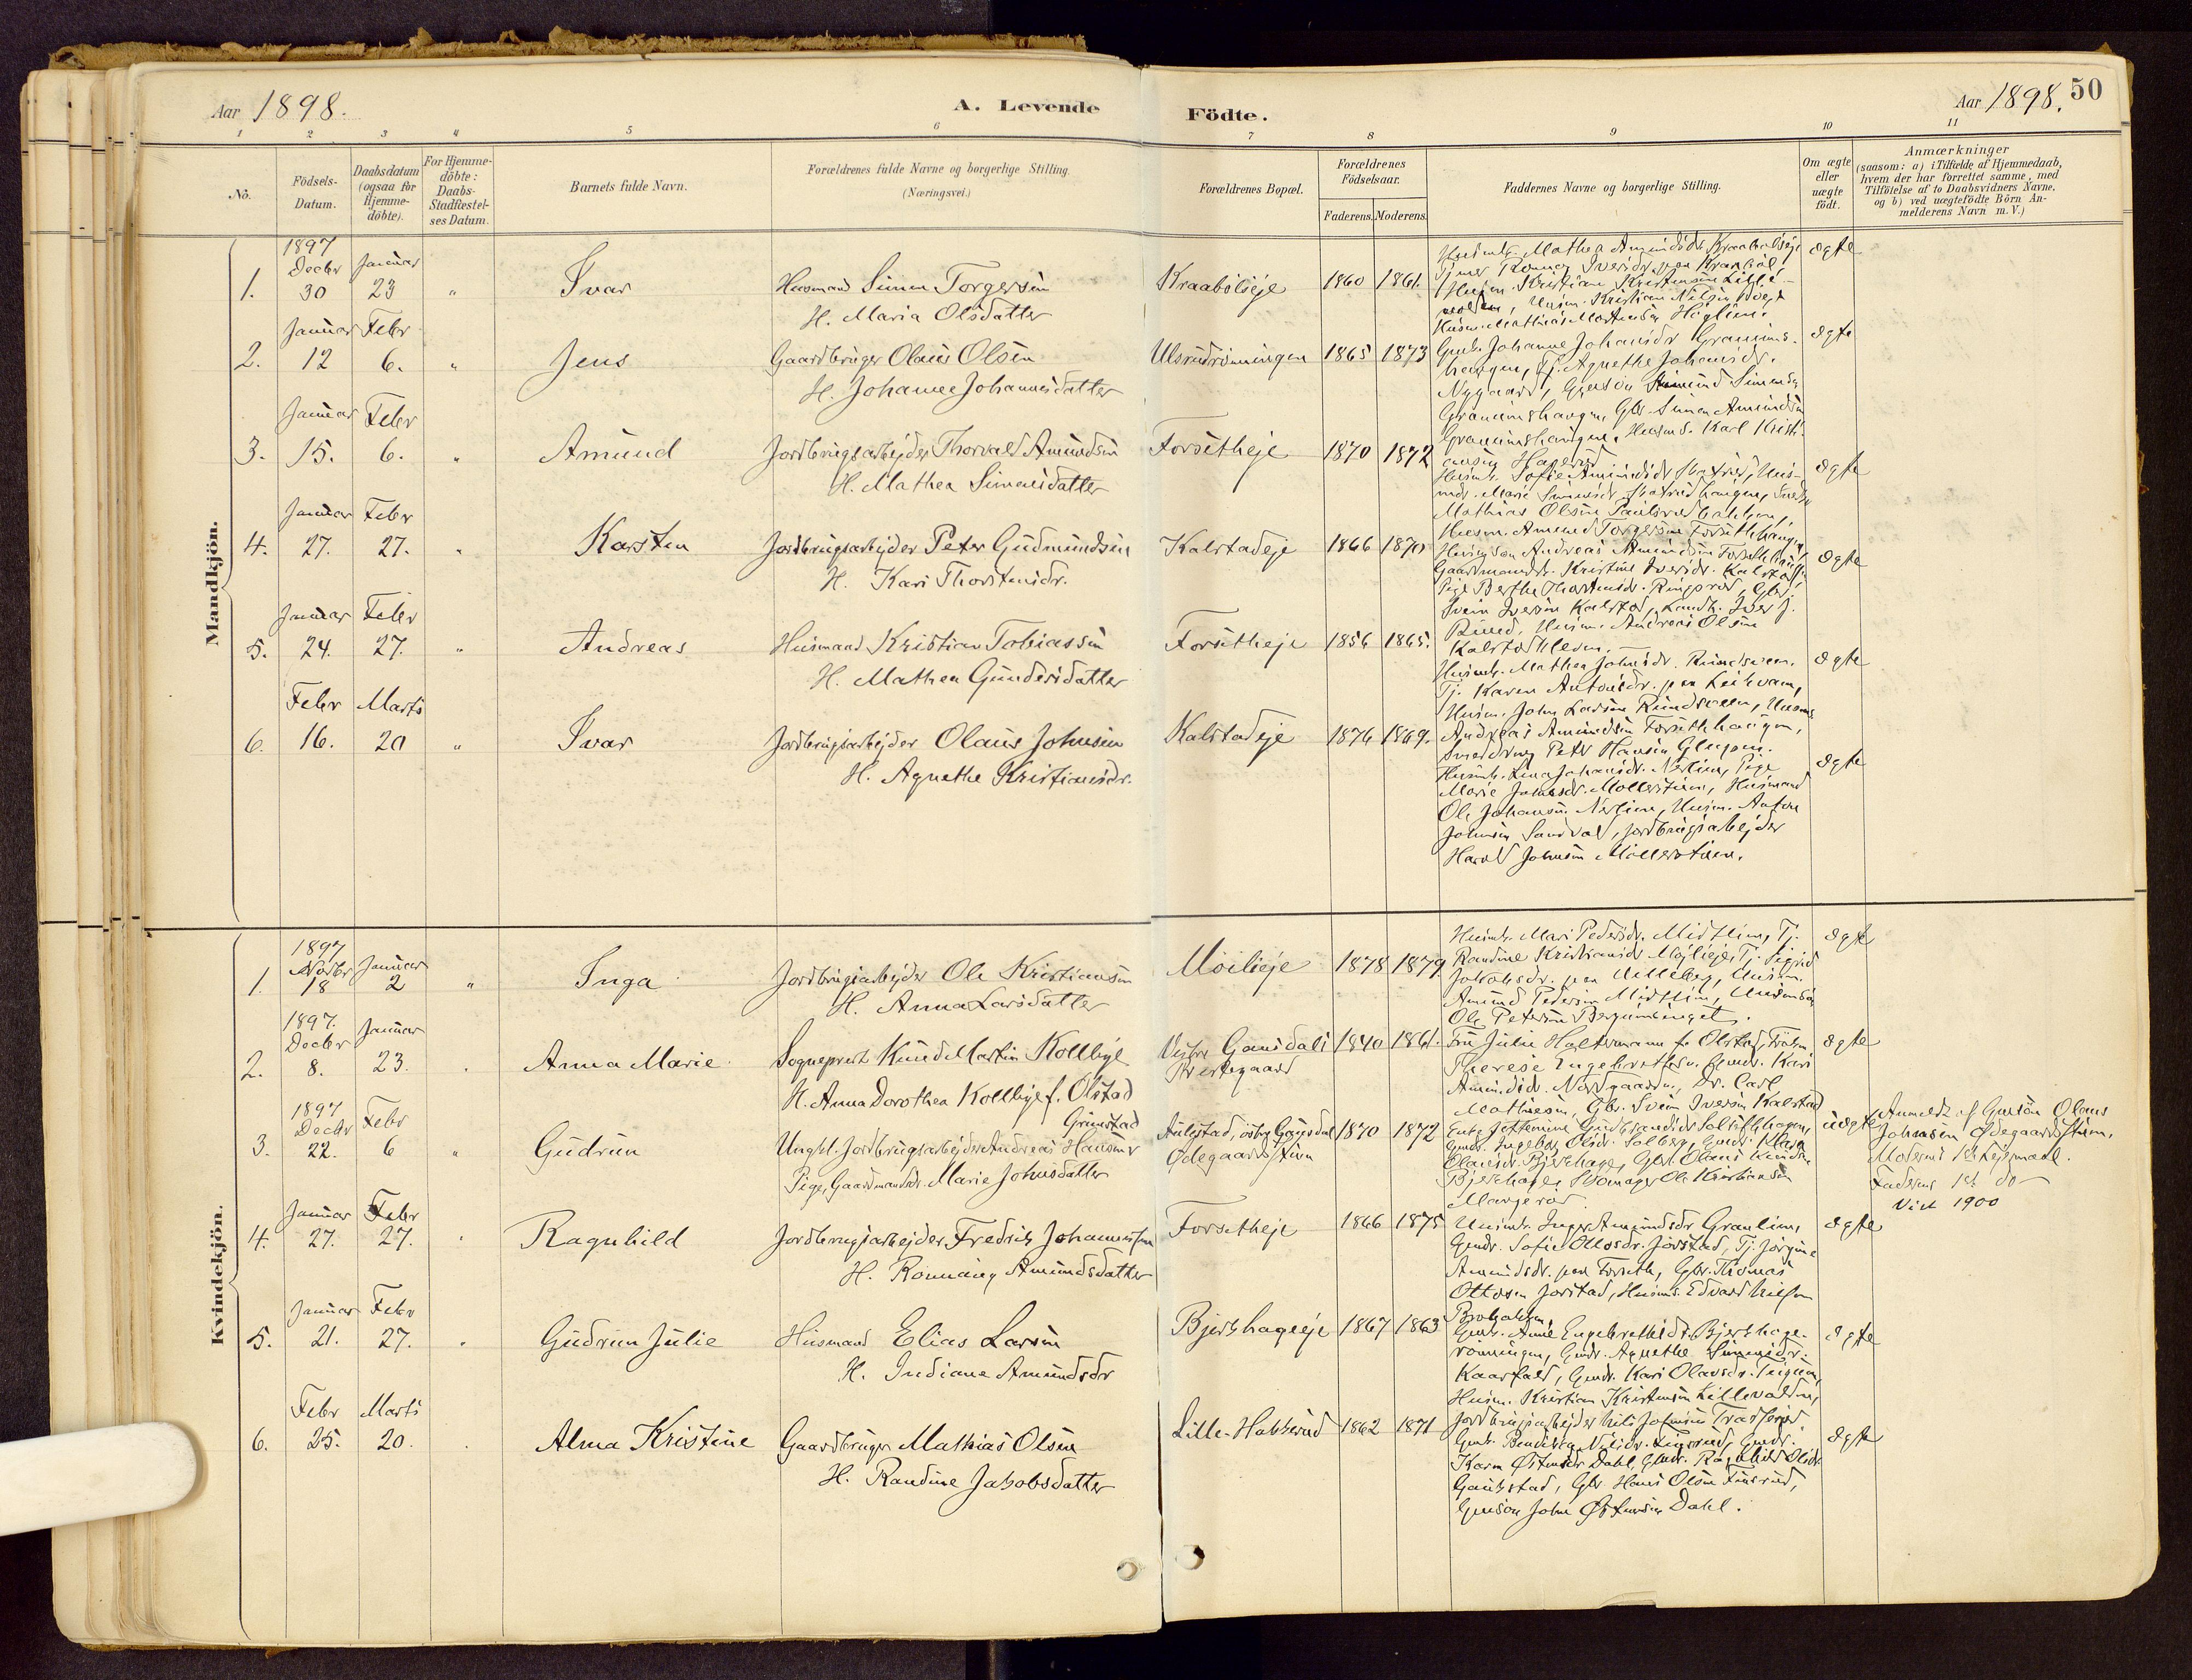 SAH, Vestre Gausdal prestekontor, Ministerialbok nr. 1, 1887-1914, s. 50